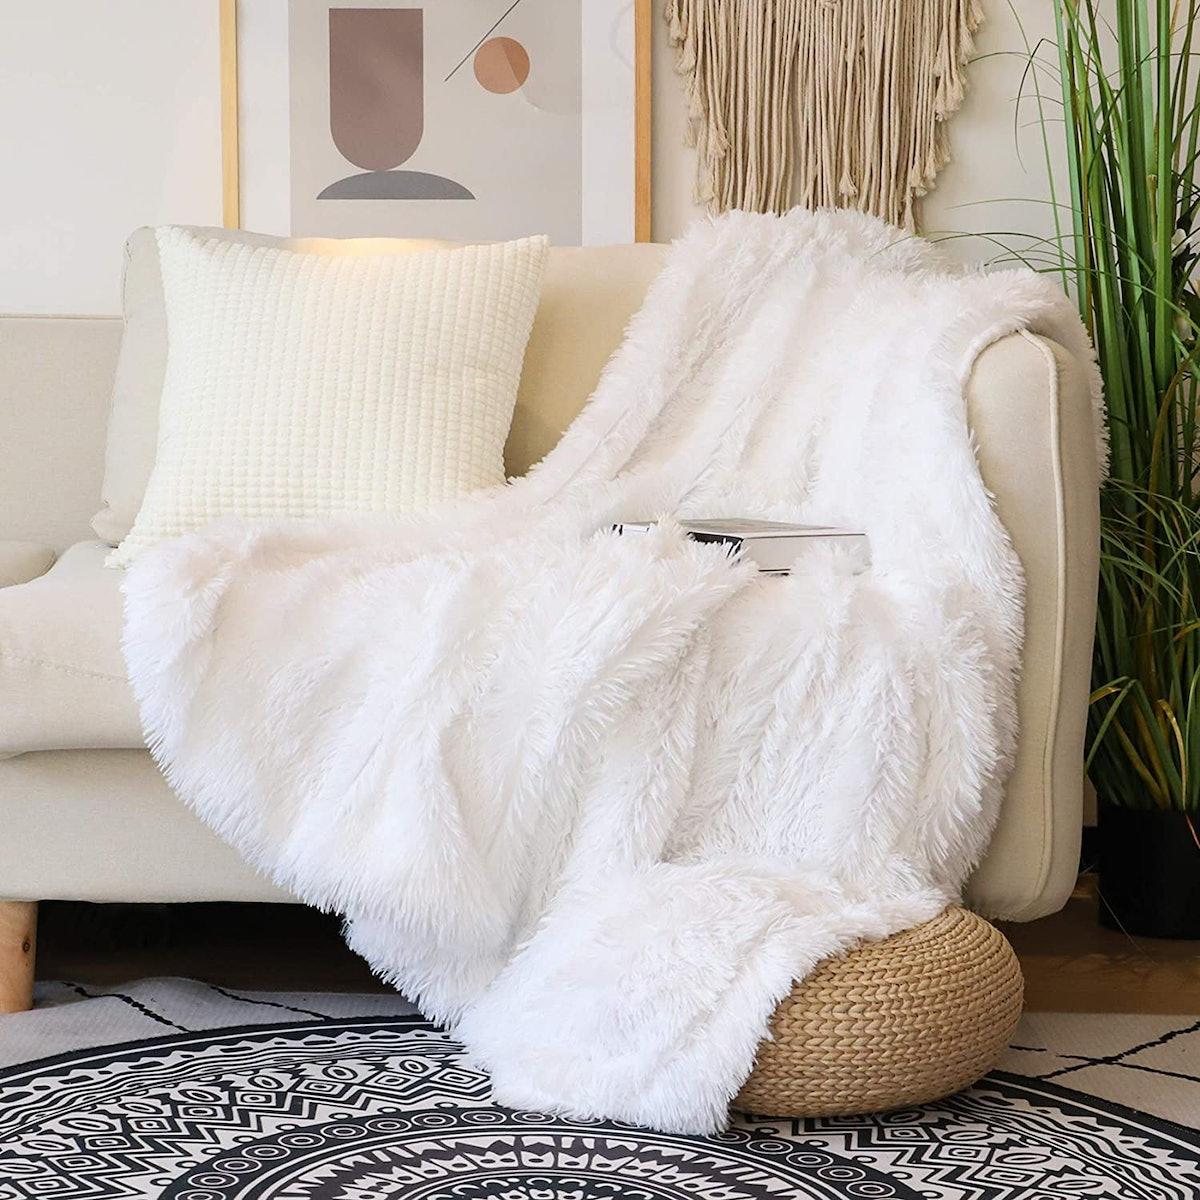 "Tuddrom Soft Faux Fur Throw Blanket (50"" x 60"")"